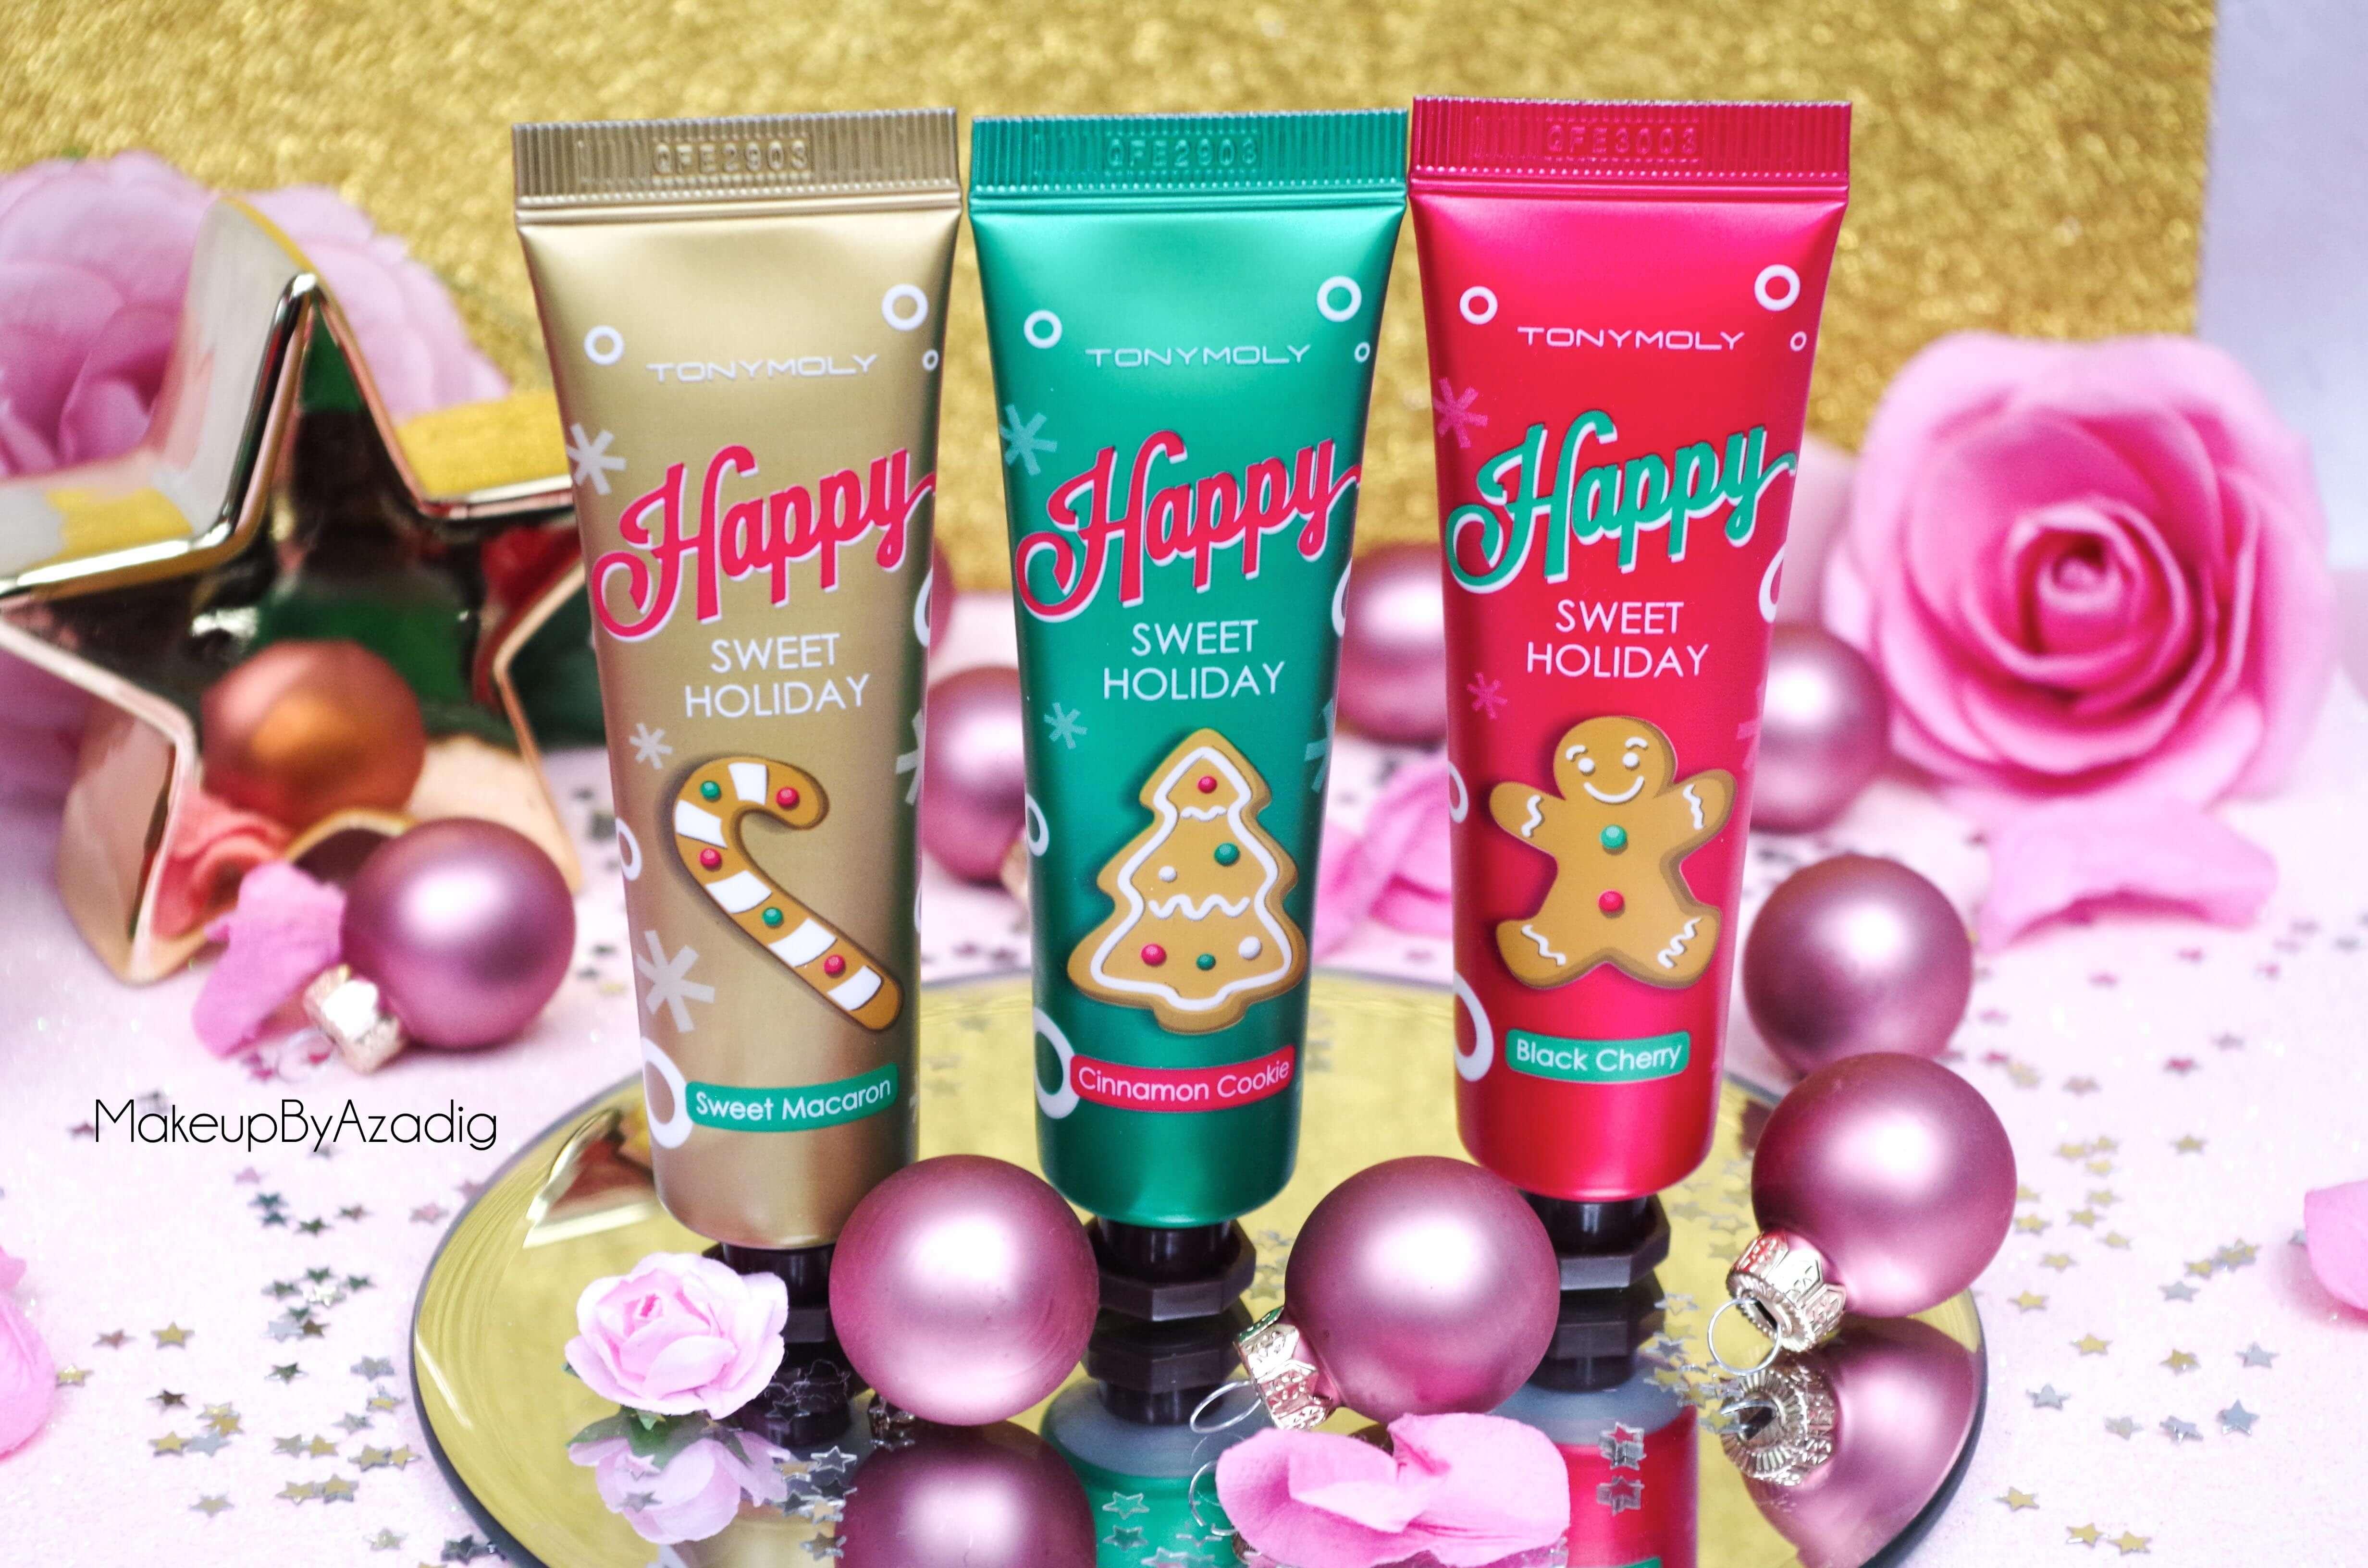 makeupbyazadig-tonymoly-sephora-paris-troyes-creme-mains-collection-noel-holiday-avis-revue-love